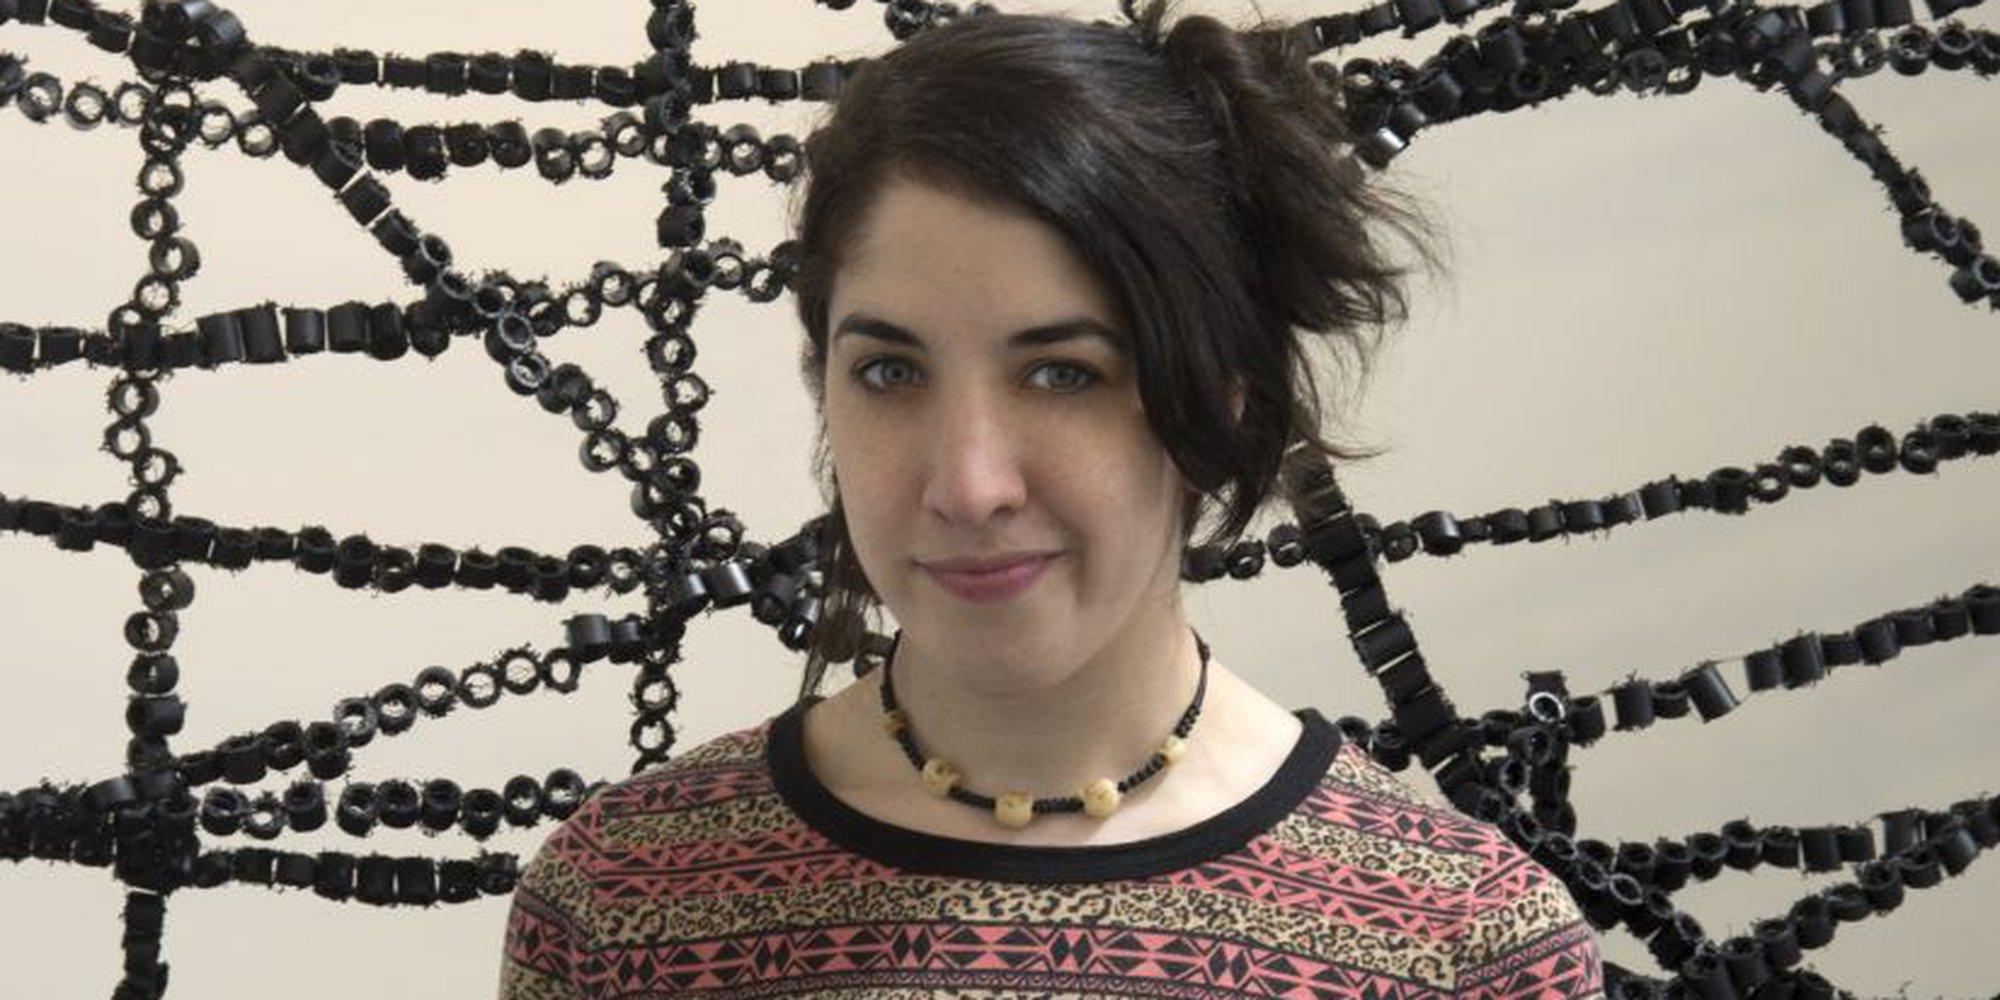 Artfinder Meets: Becca Levine